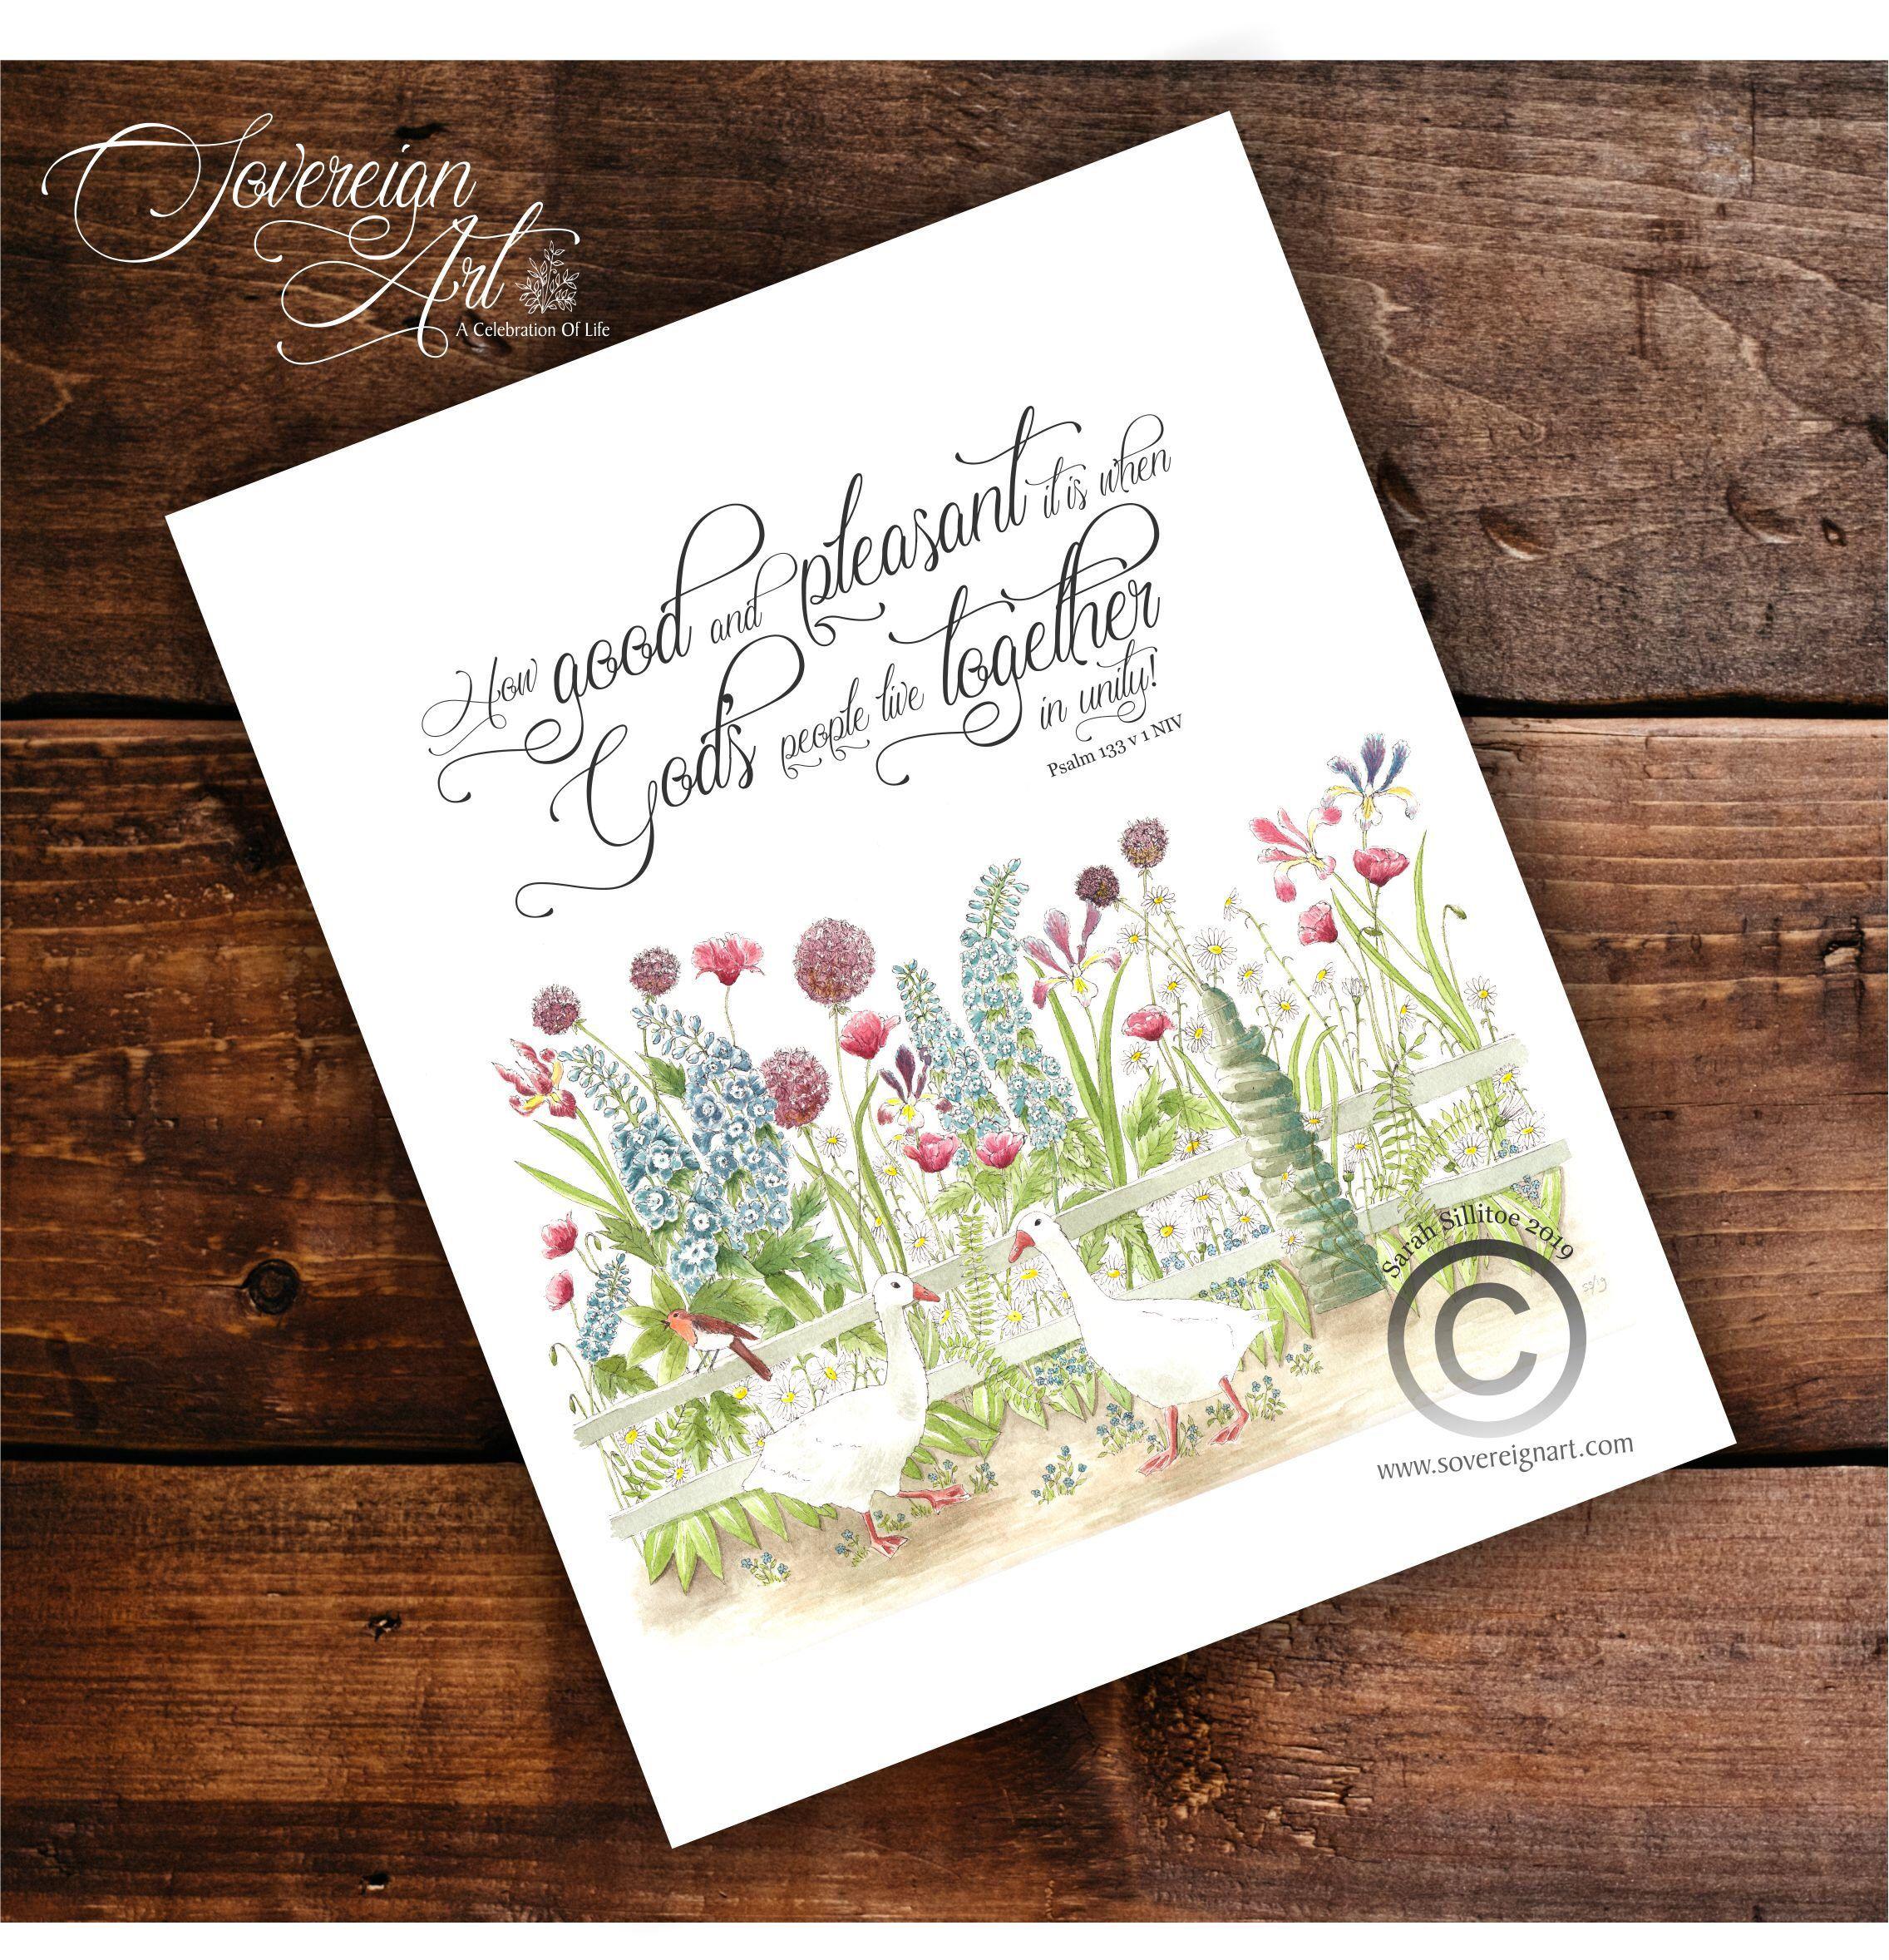 Christian art print bible verse psalm 133 v 1 how good and